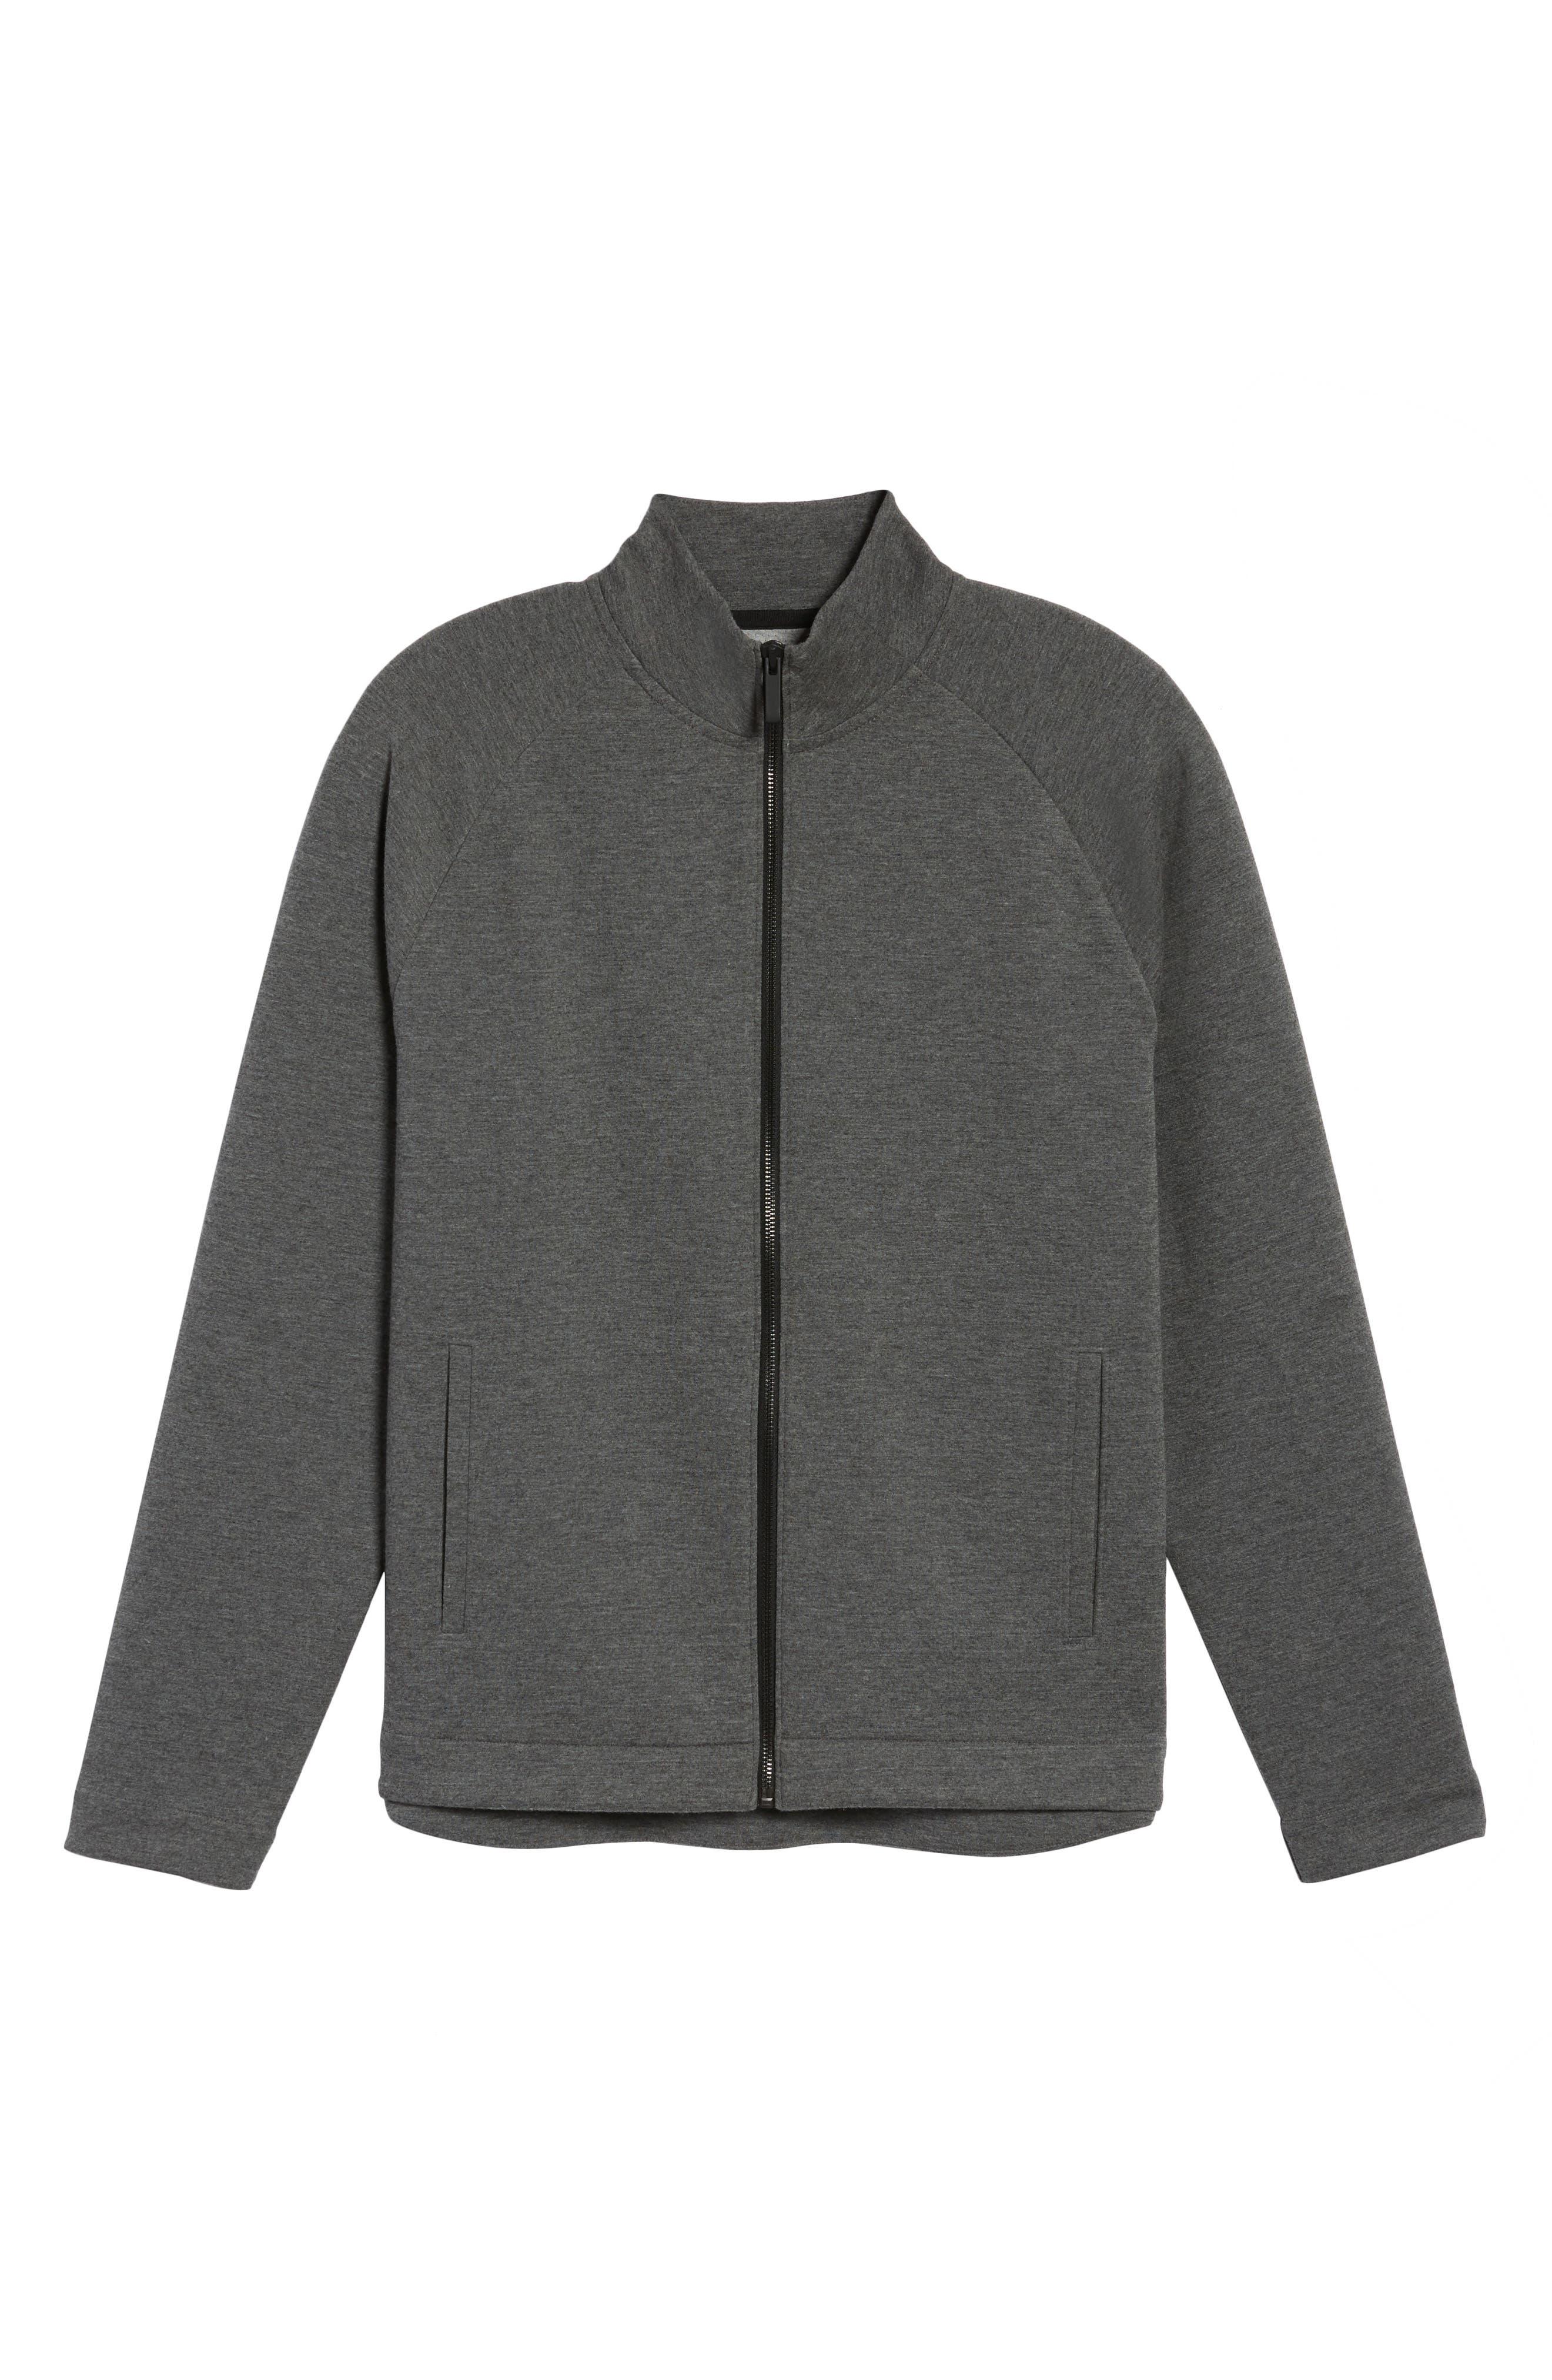 Fleece Jacket,                             Alternate thumbnail 6, color,                             Grey Magnet Heather